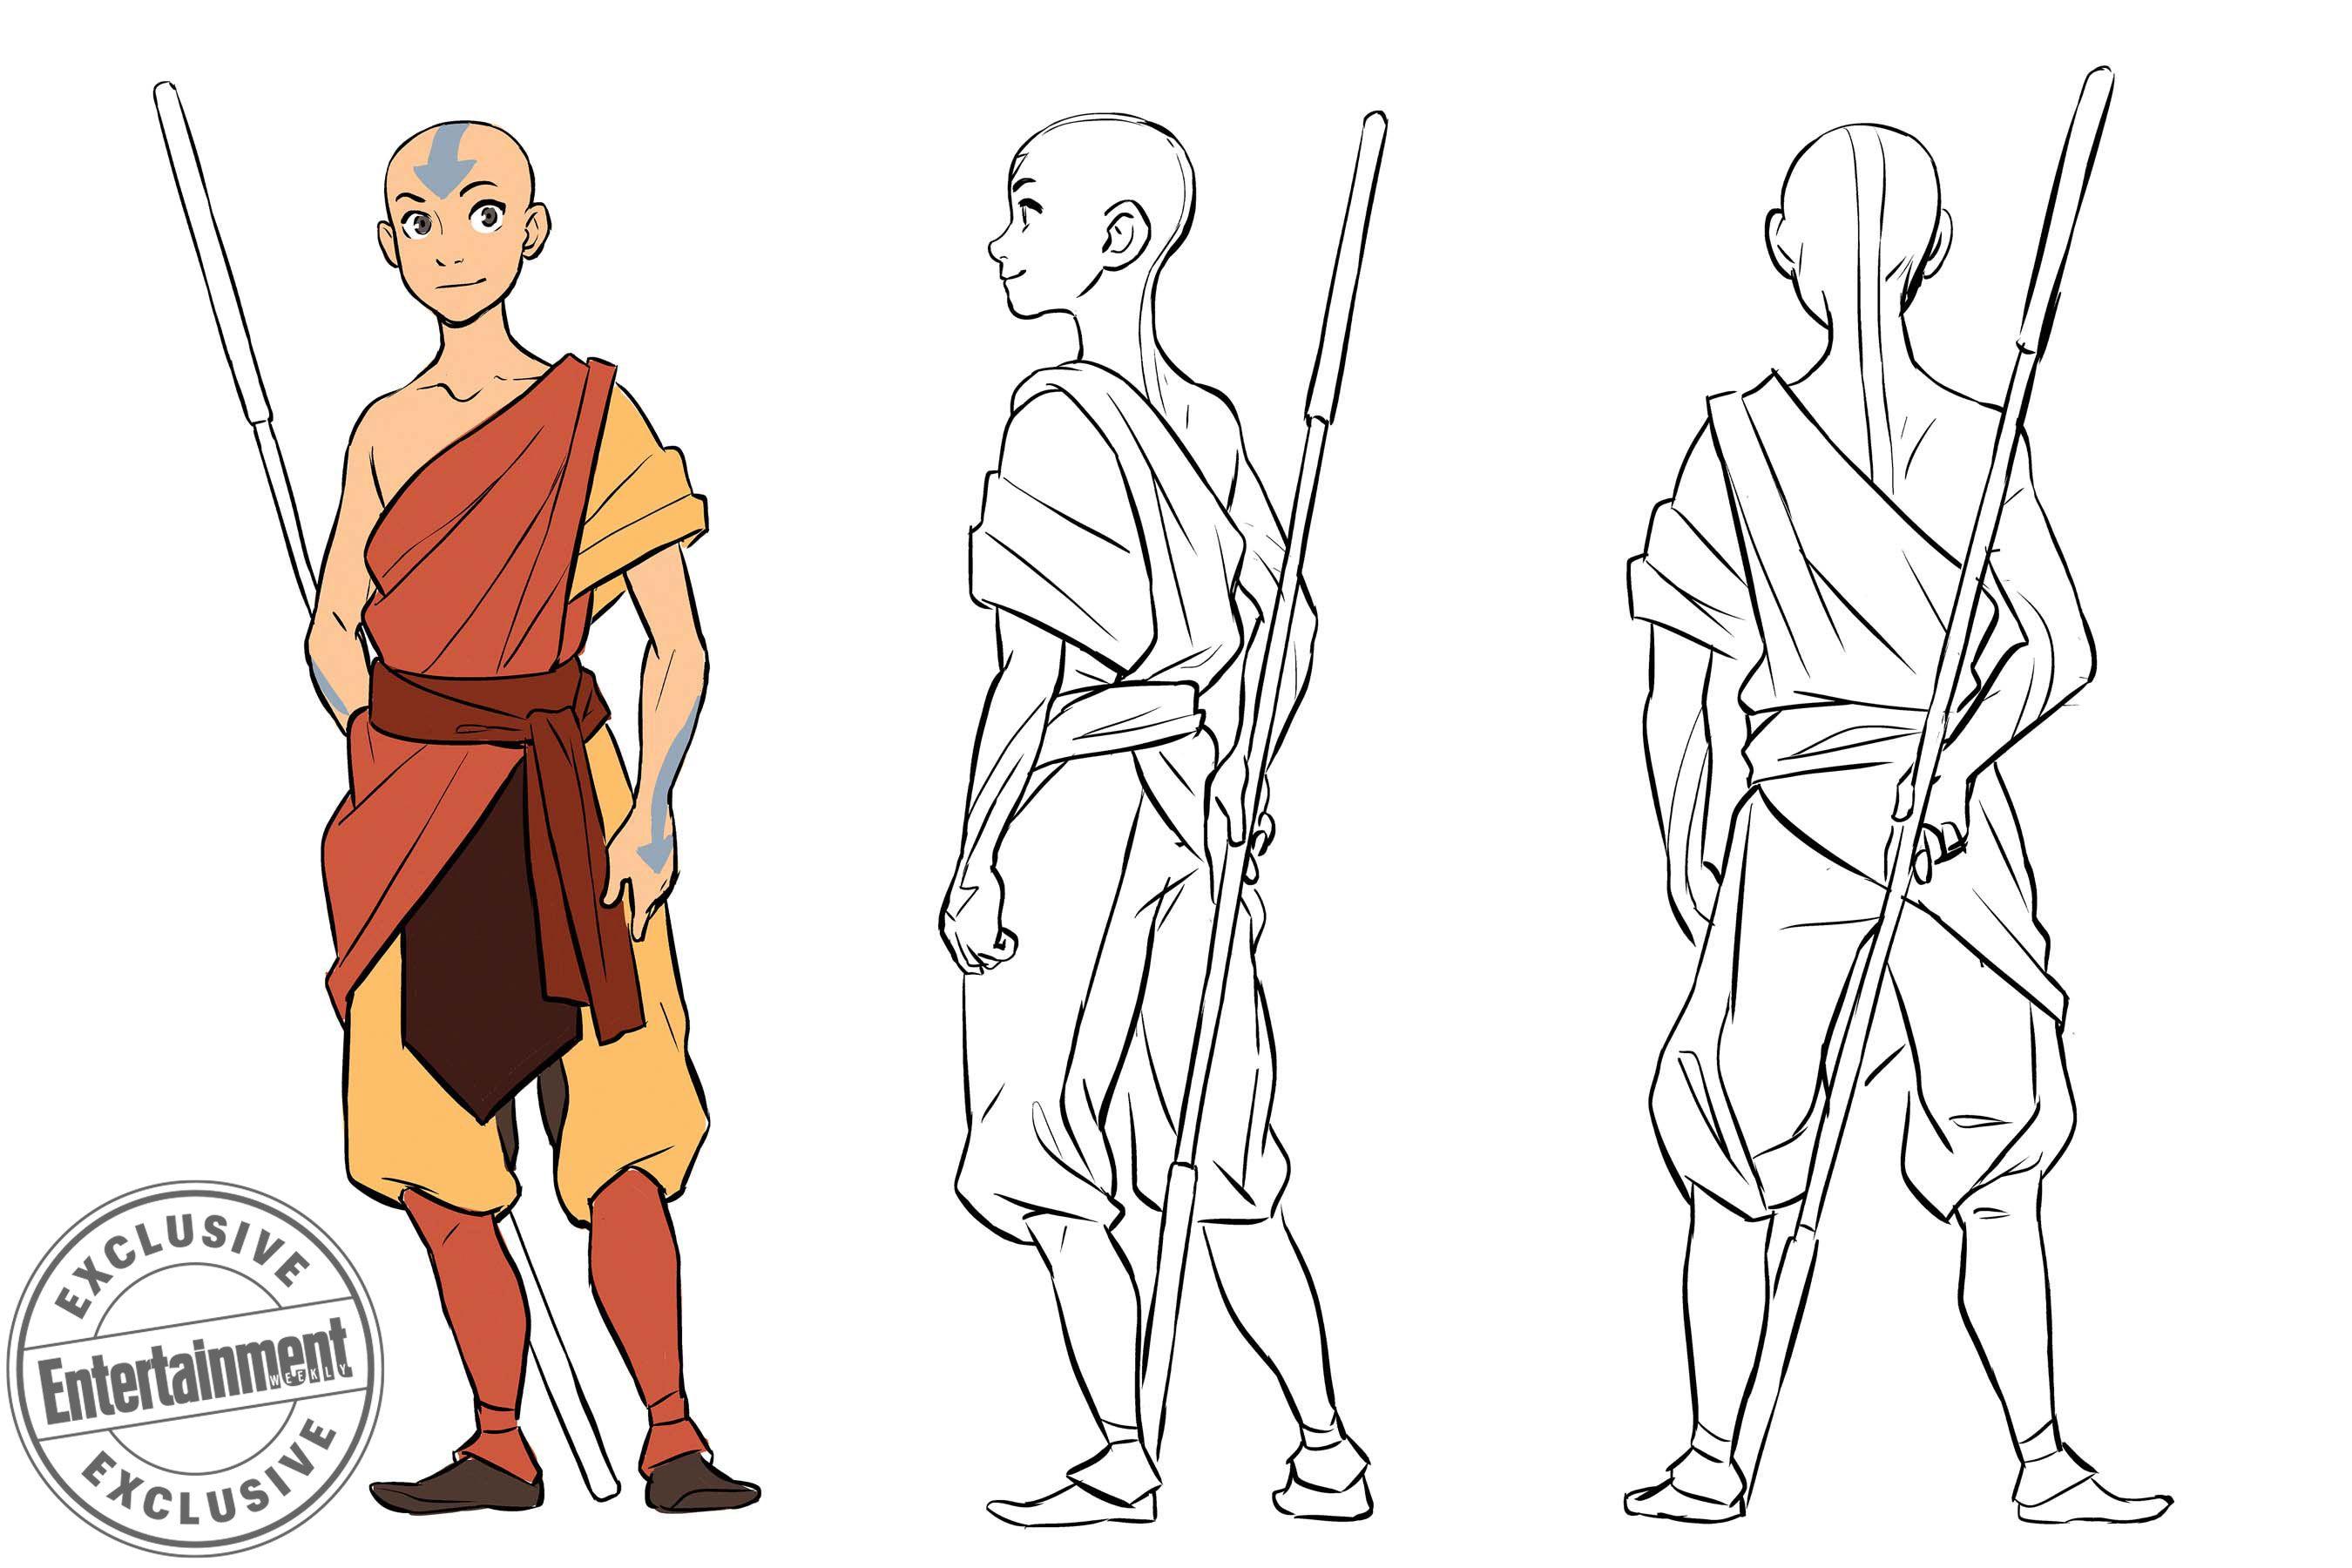 avatar character design avatar: the last airbender' comic gets new creators, new